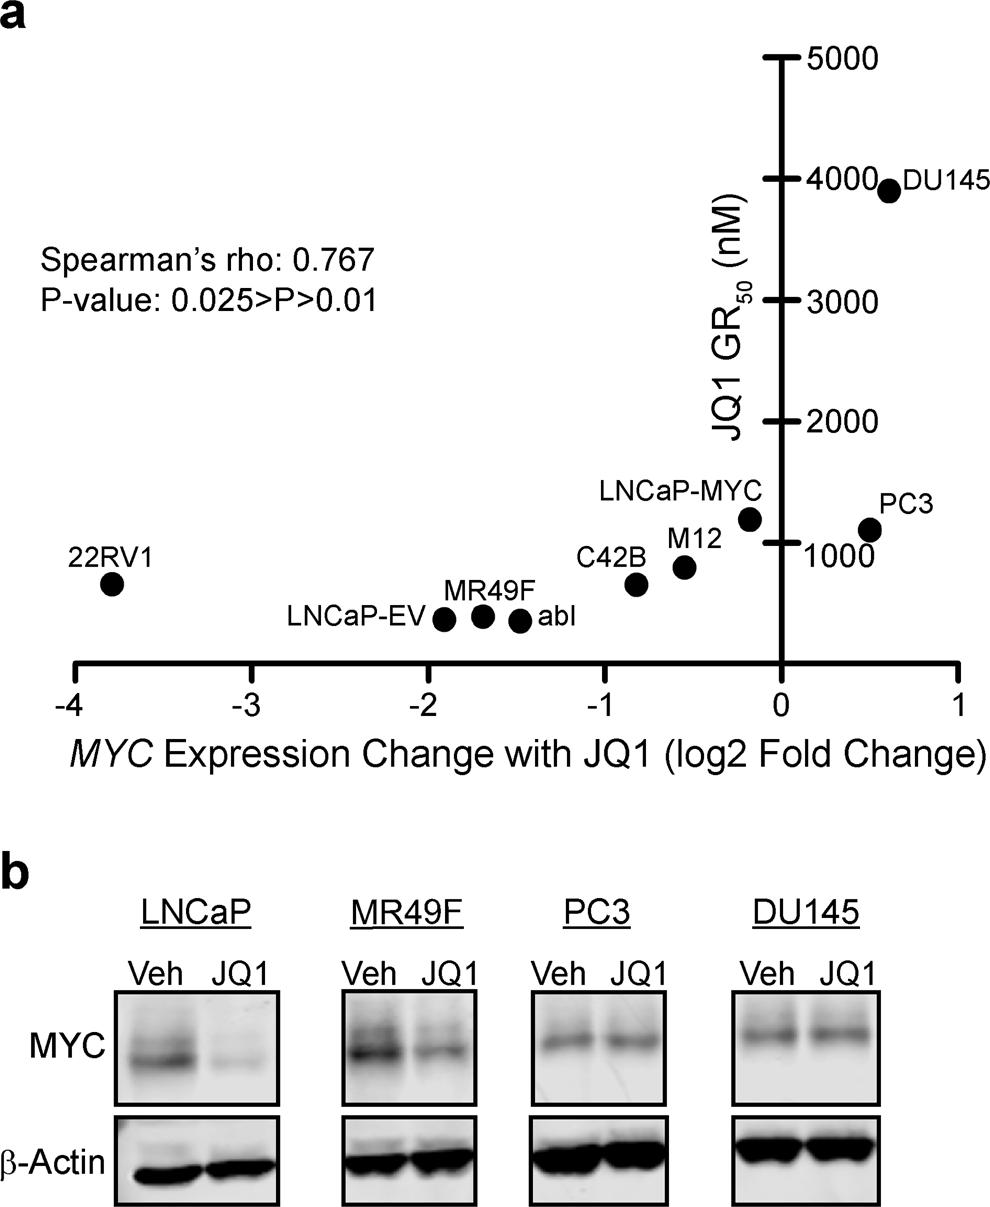 Maintenance of MYC expression promotes de novo resistance to